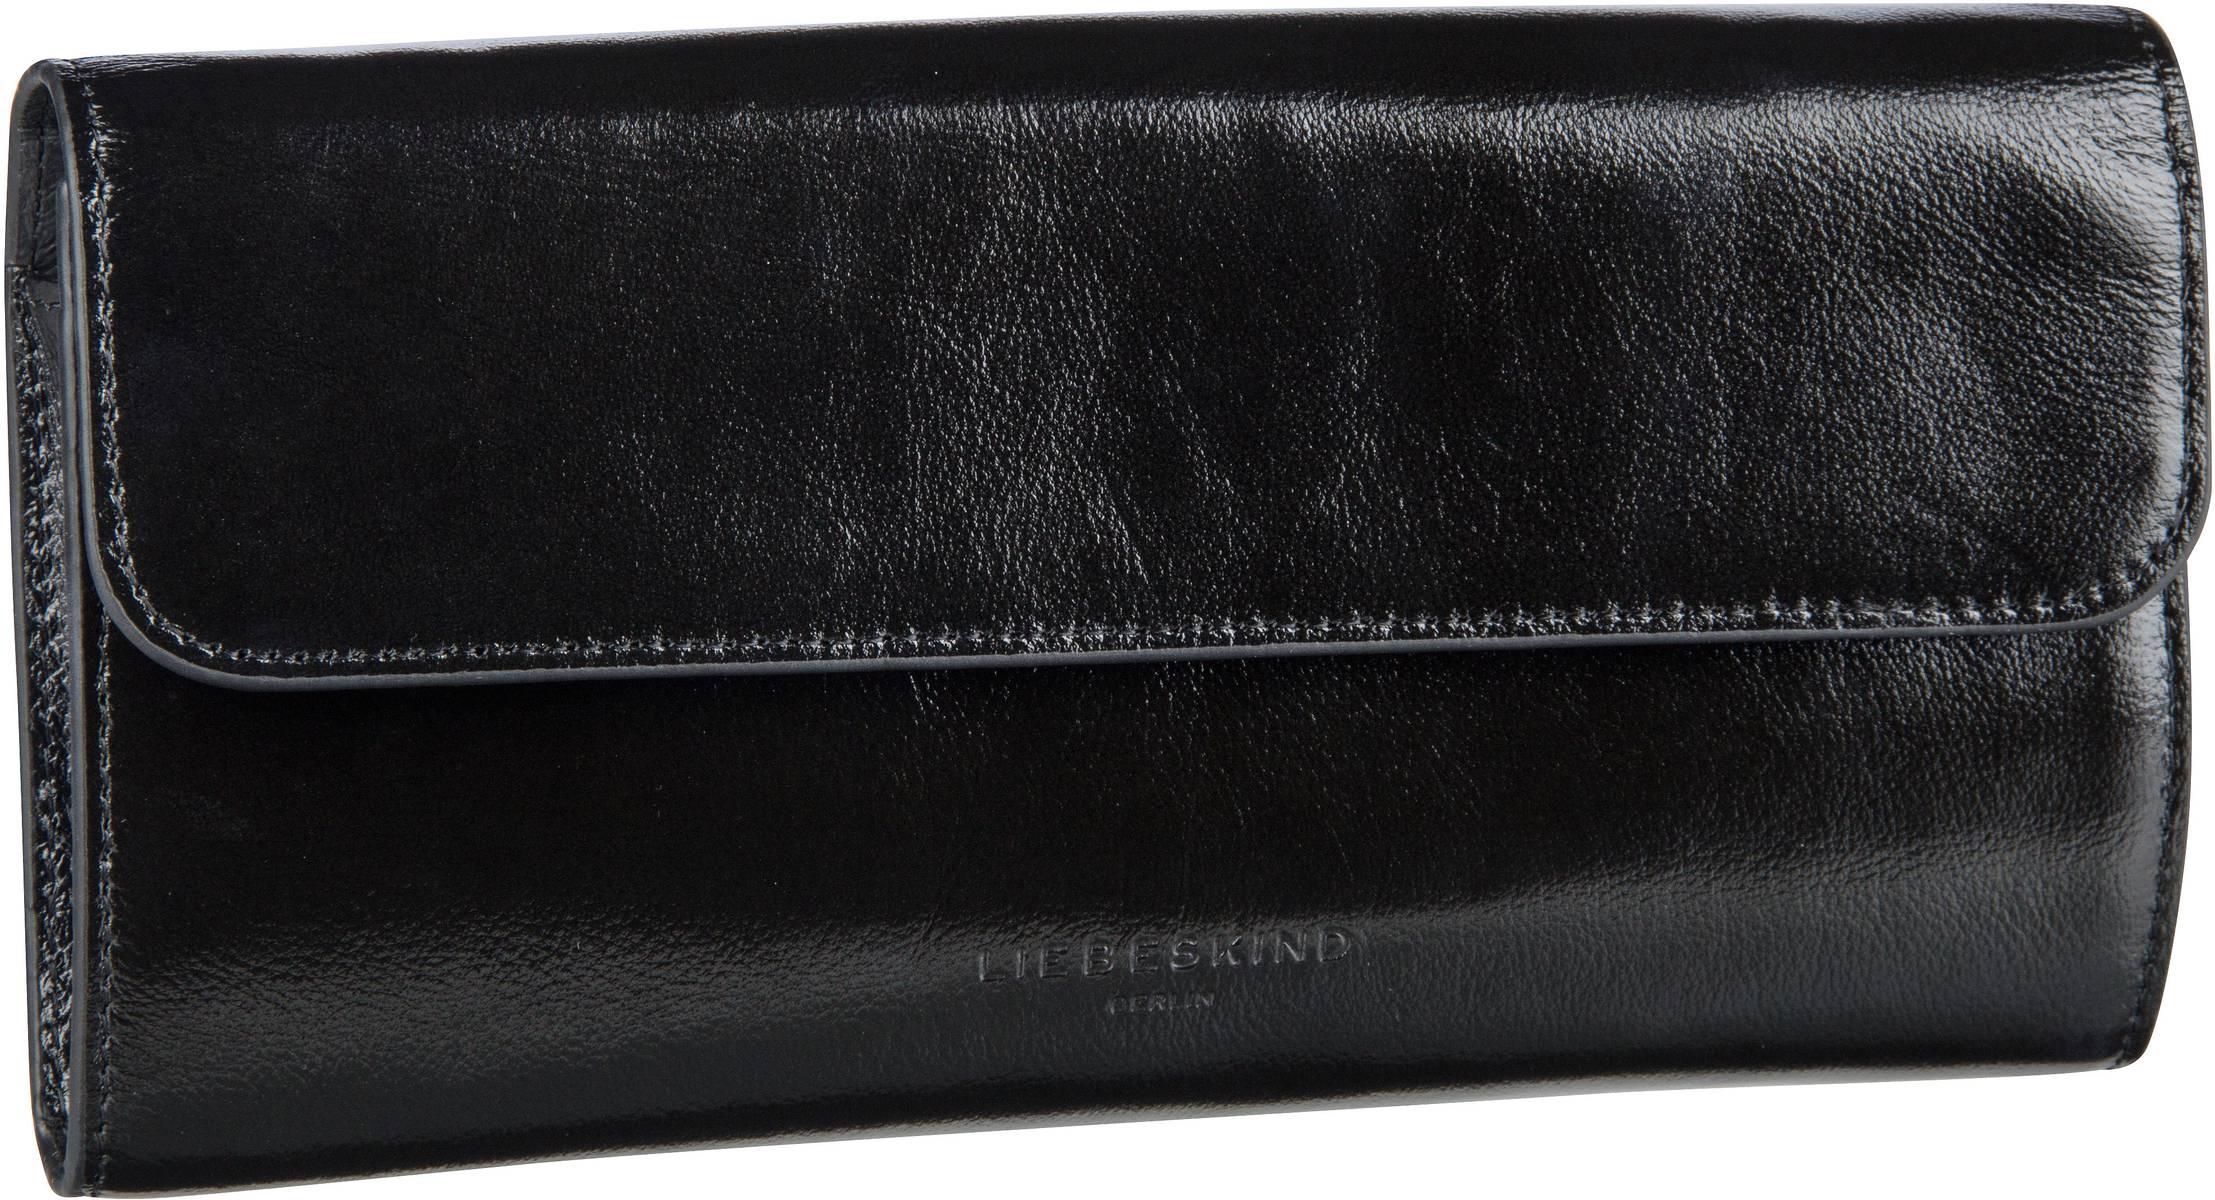 Berlin Handtasche Glossy Samantha Crossbody S Black